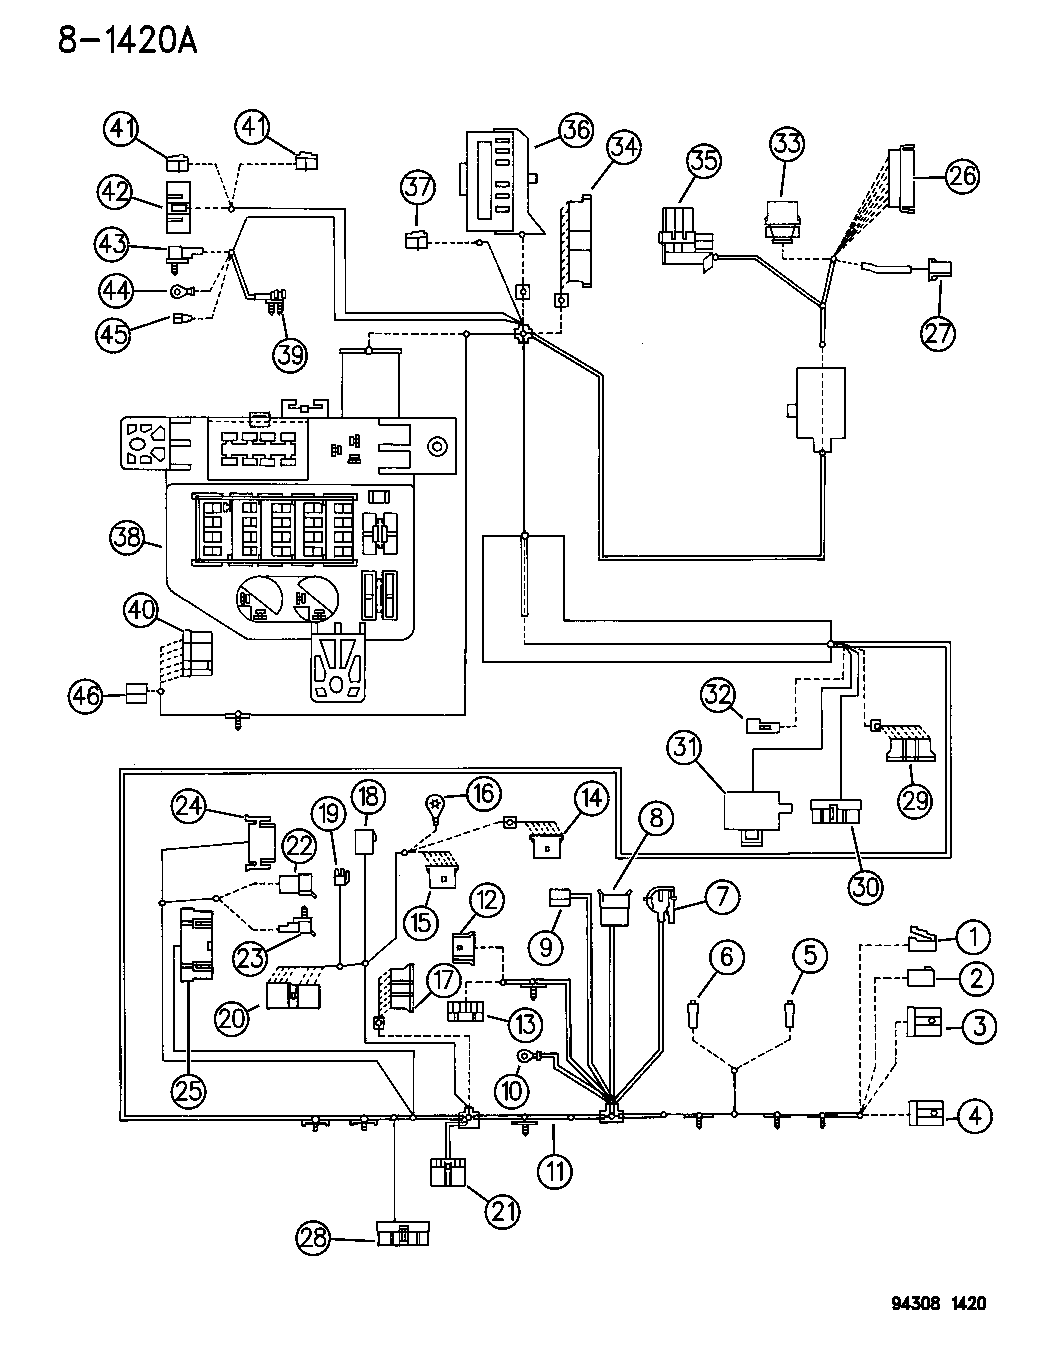 1994 Dodge Ram 2500 Wiring - Instrument Panel